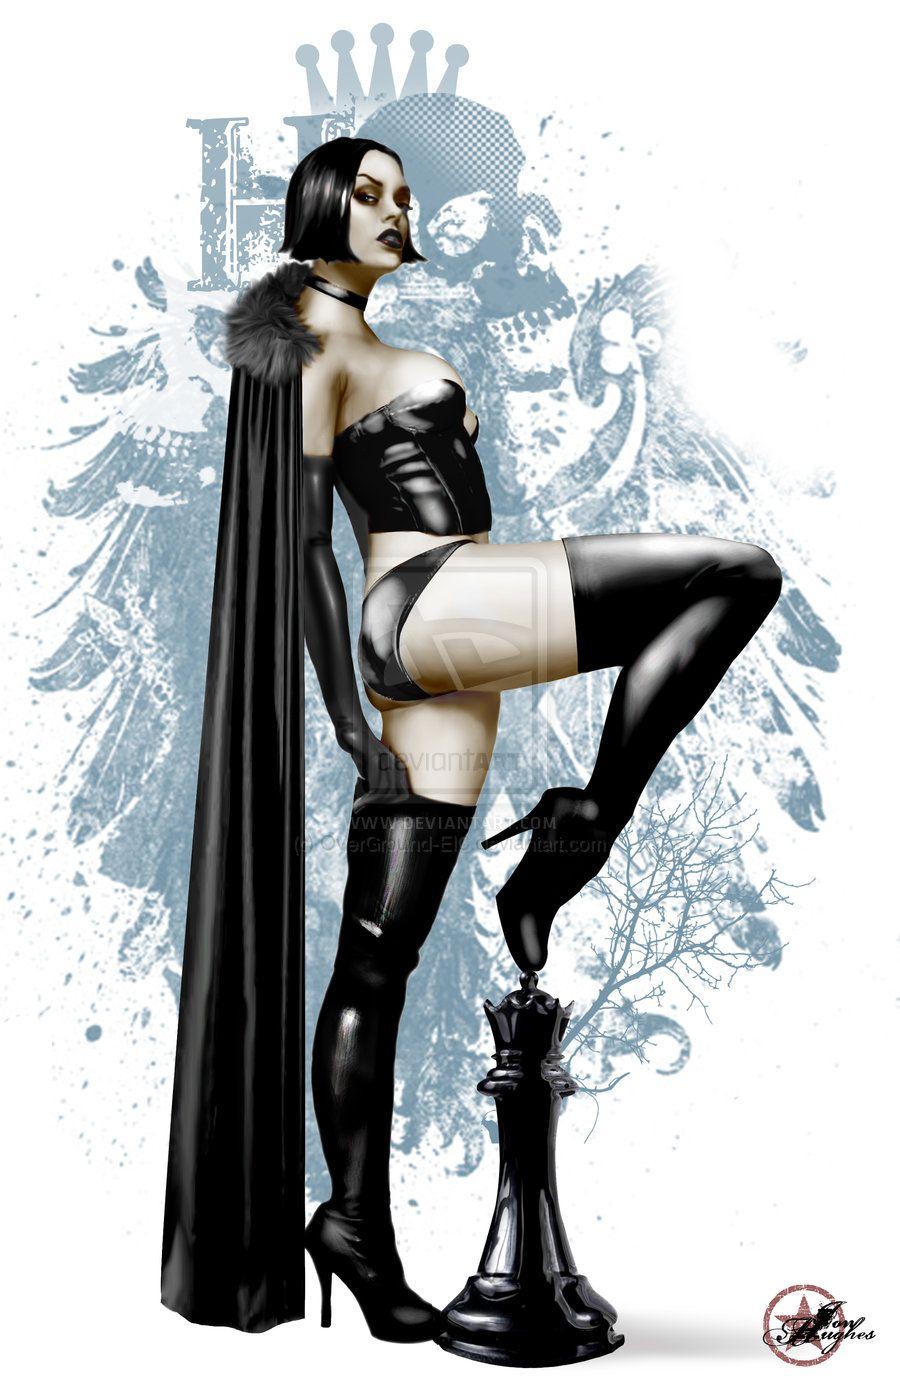 The Black Queen of the HC by JonHughes.deviantart.com on @deviantART